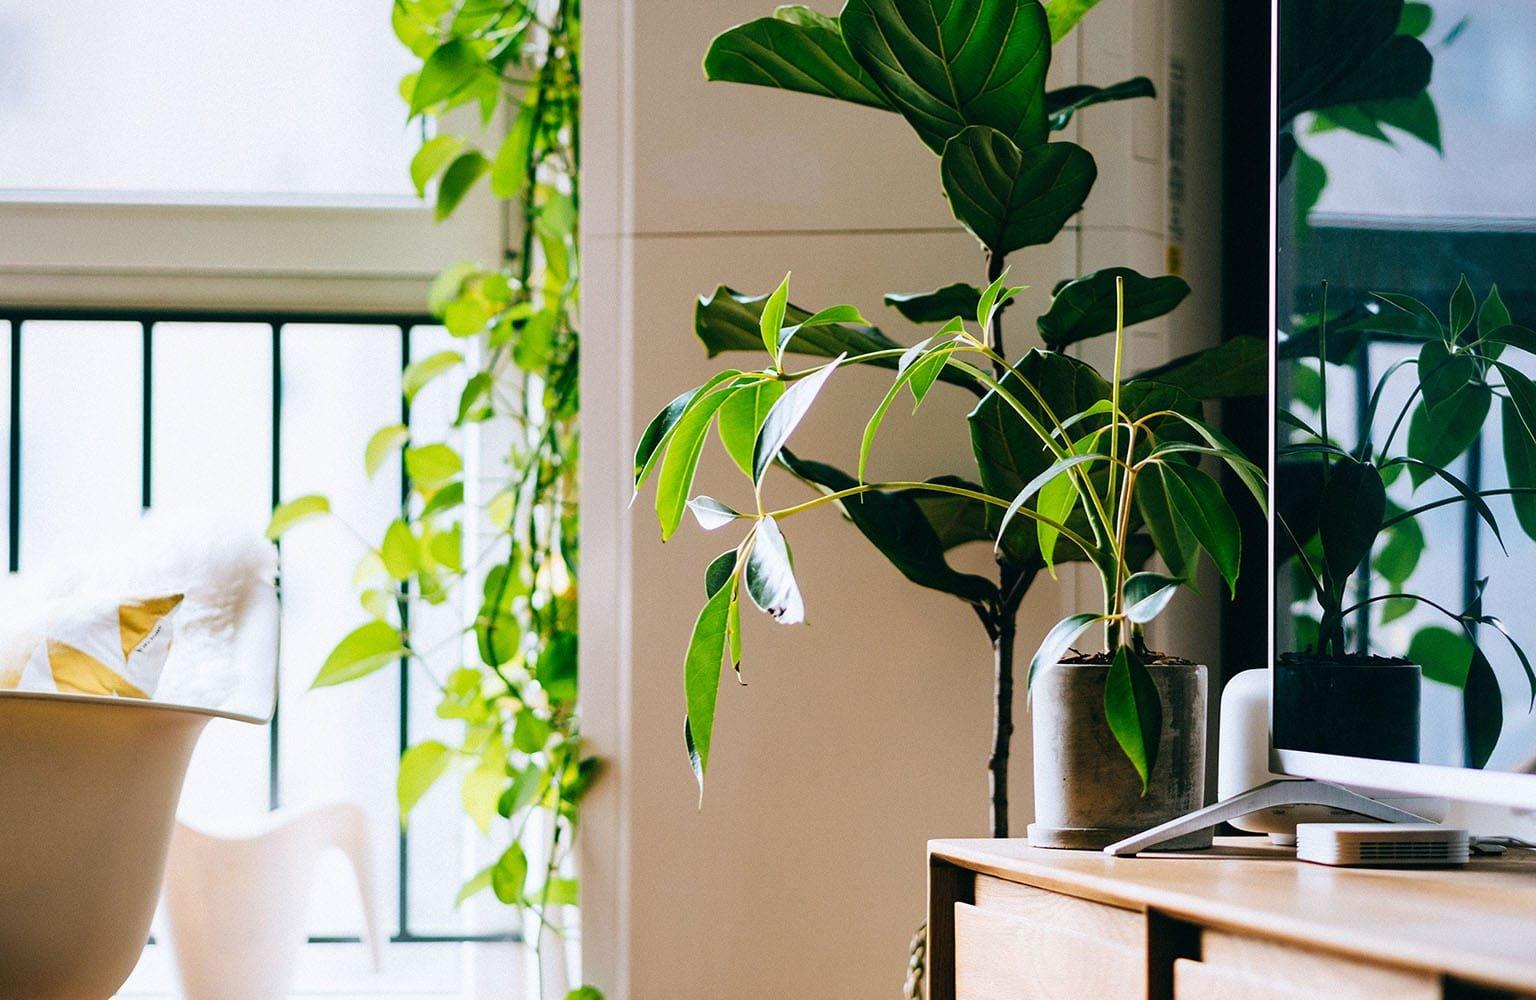 Green plant near television